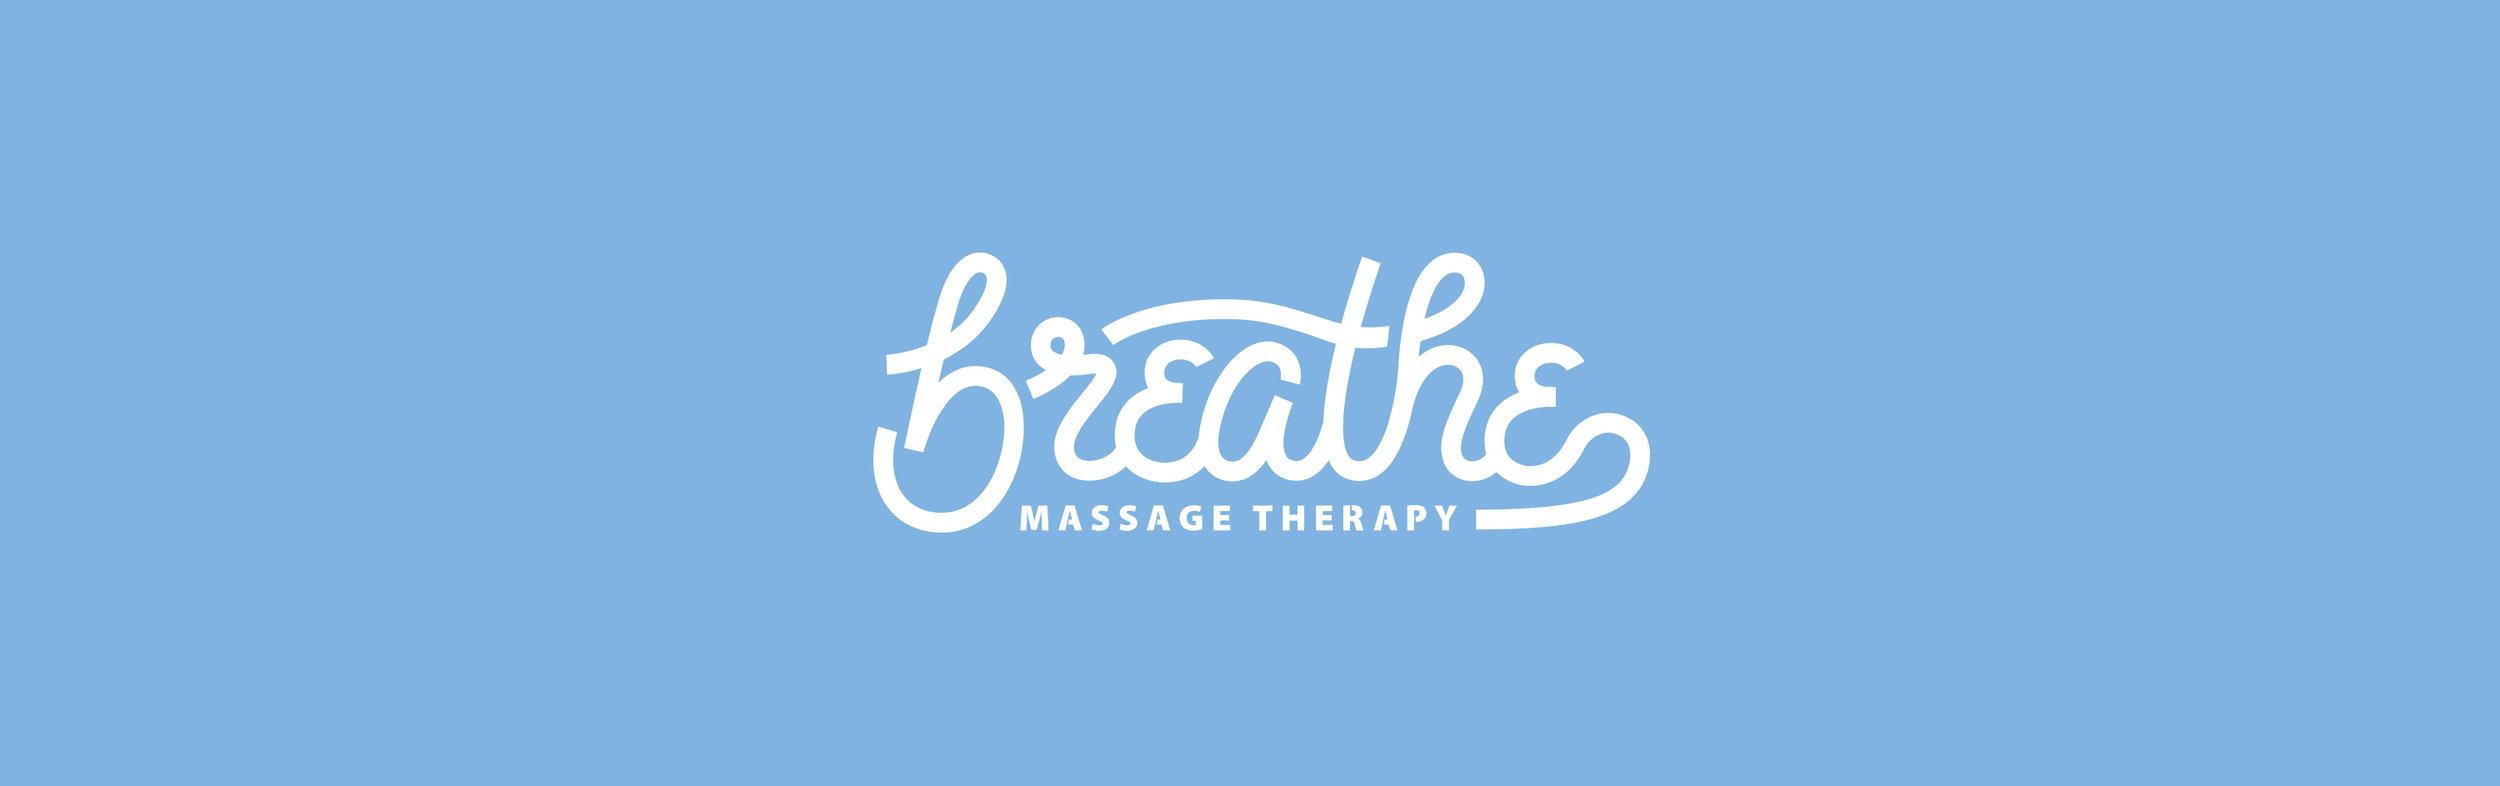 breathe_flat image.jpg